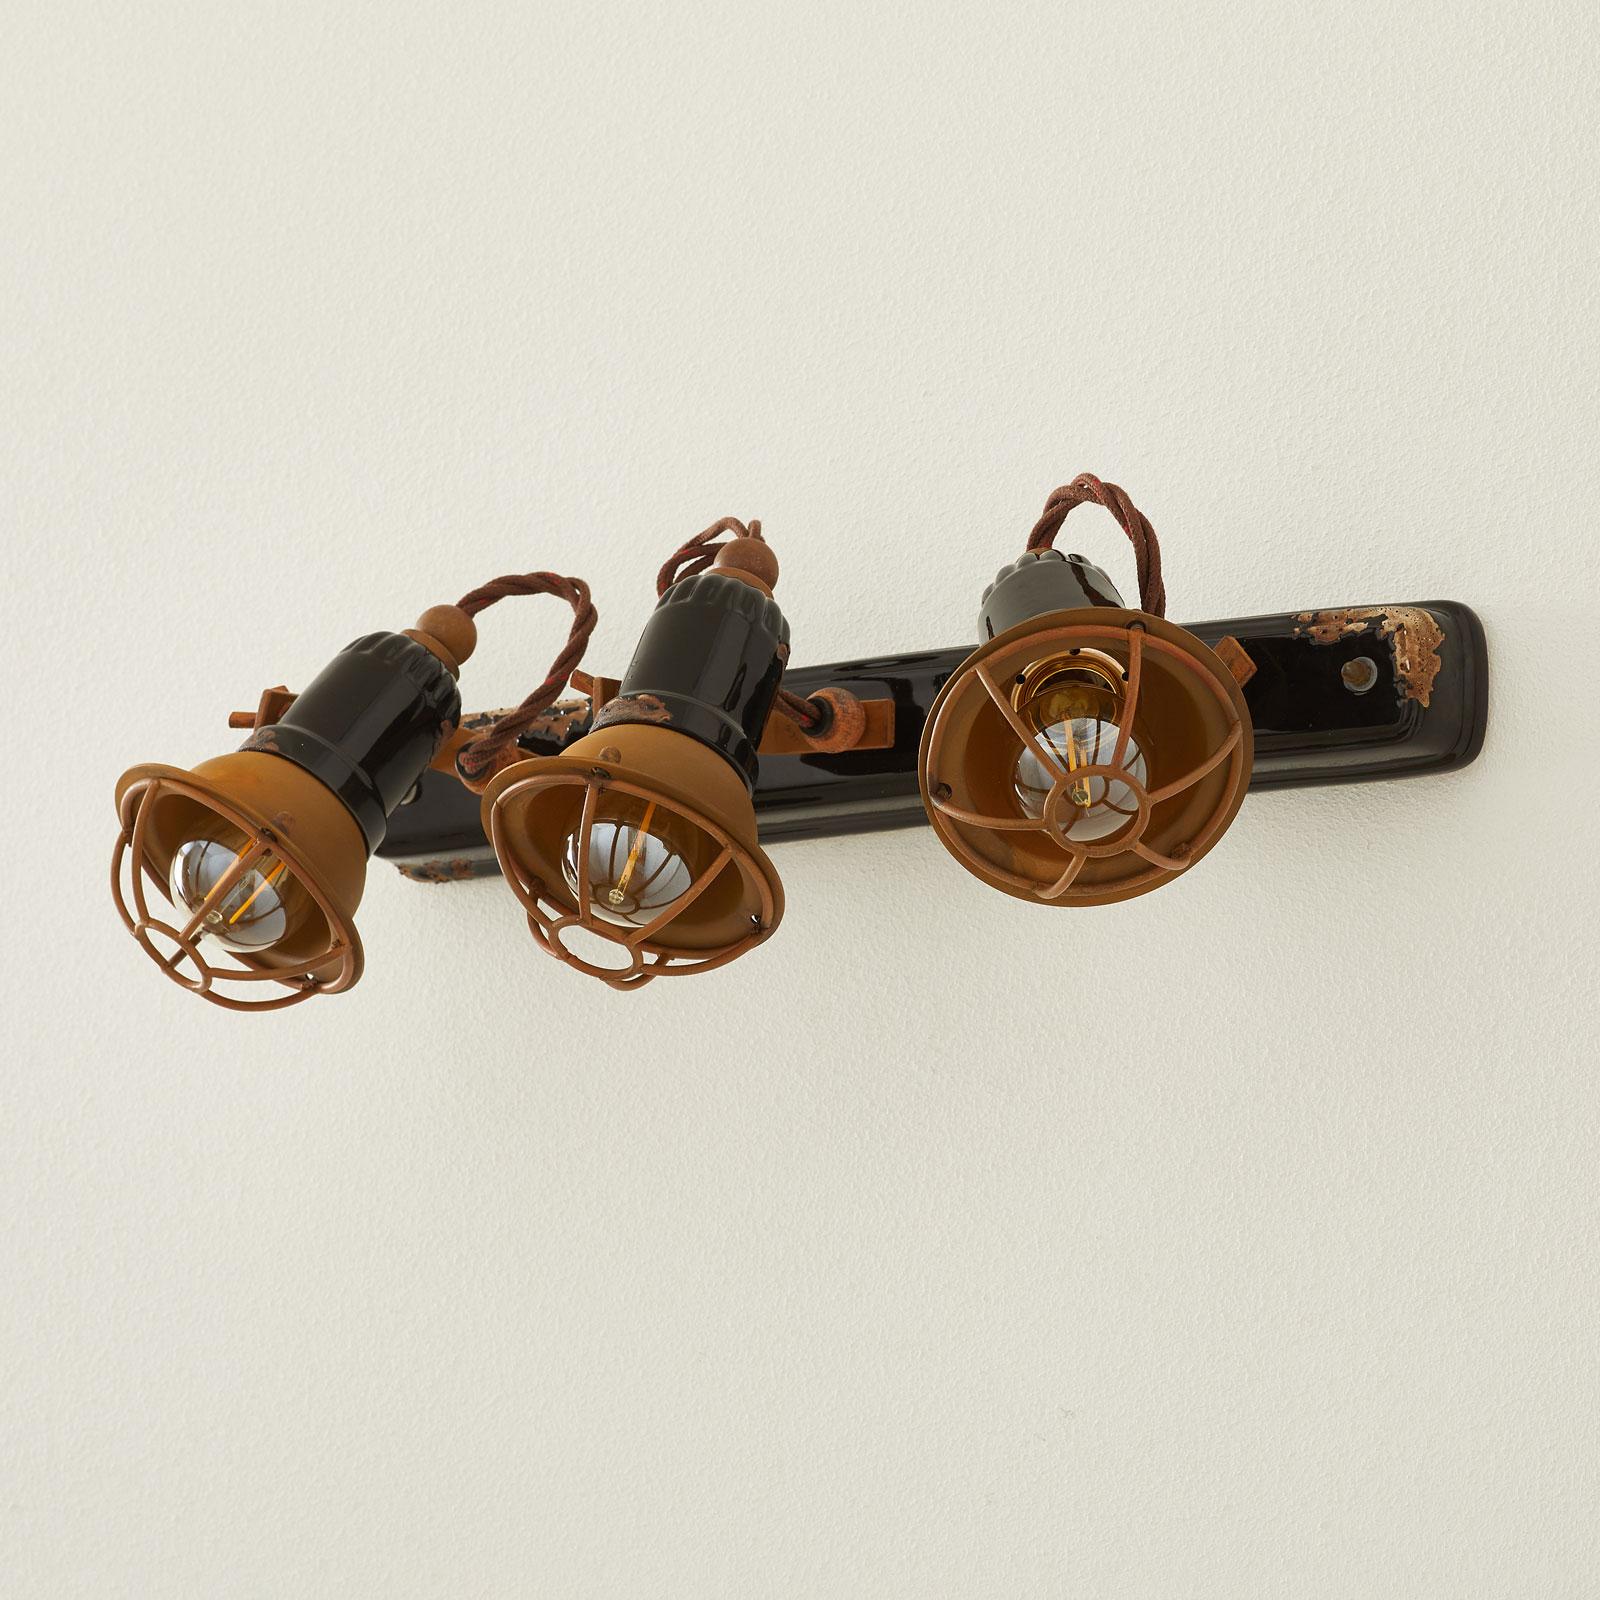 Wandlamp C1677/1 met korf, 3-lamps, zwart